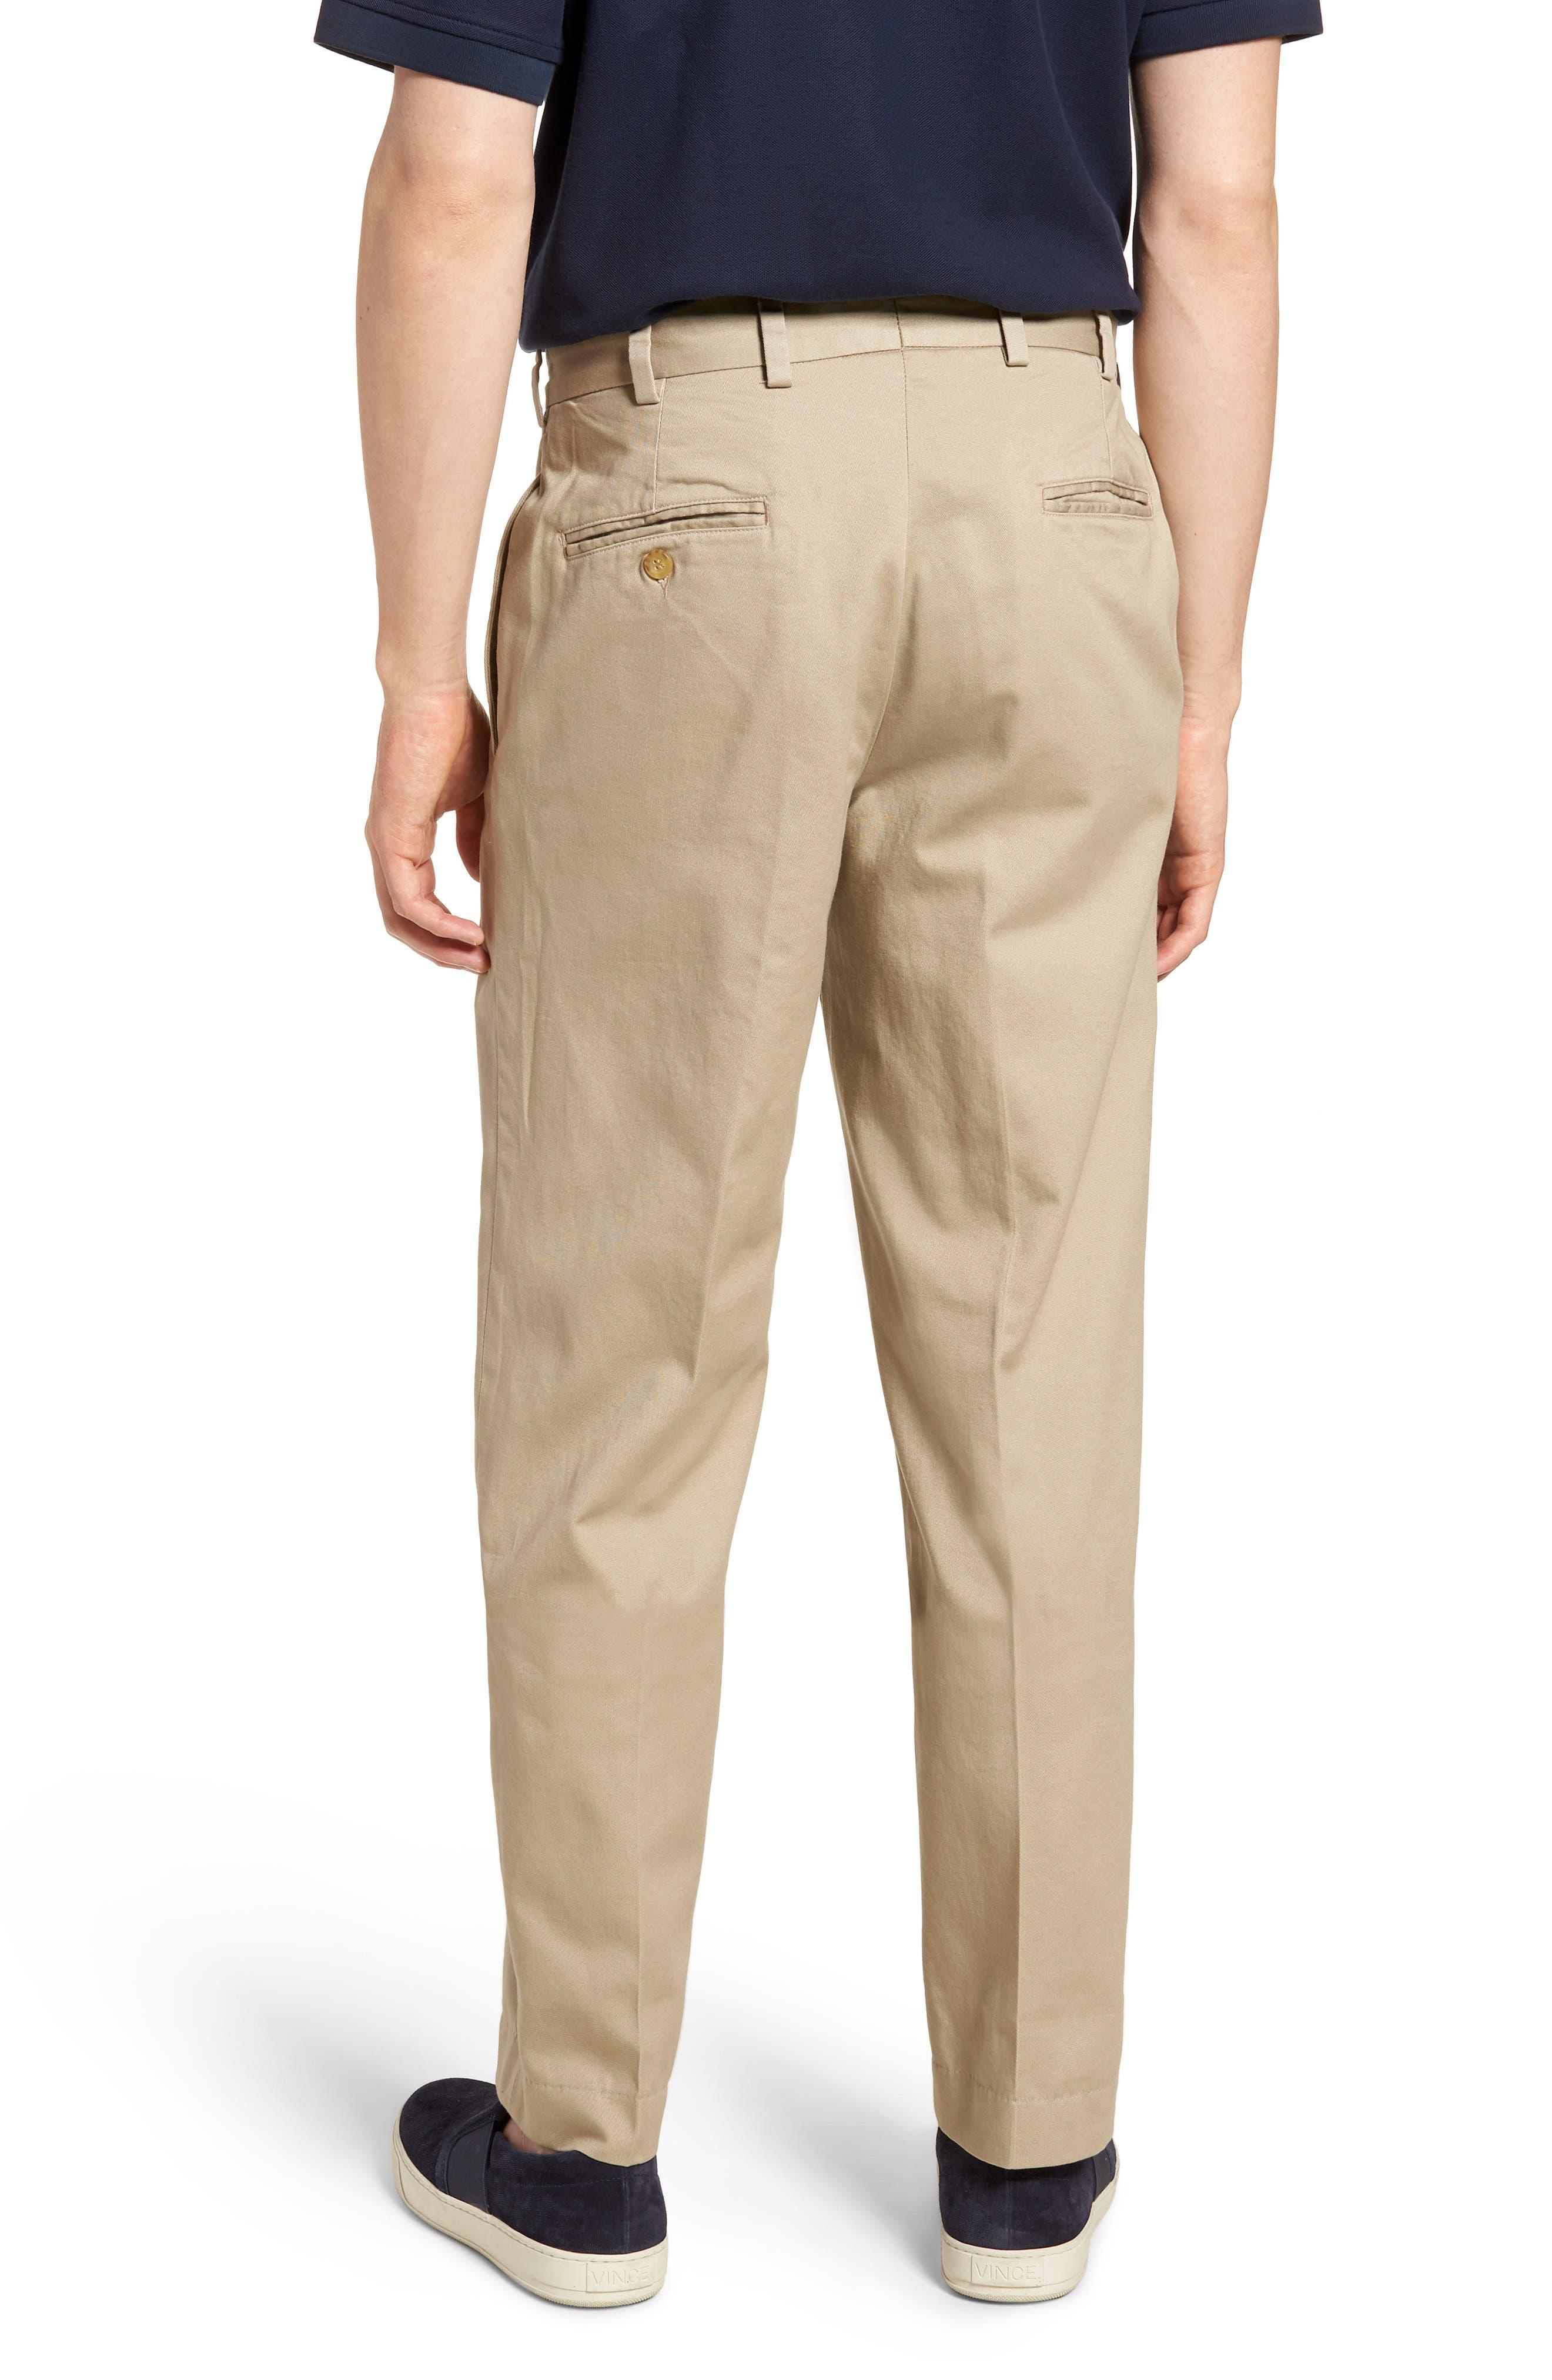 M2 Classic Fit Vintage Twill Flat Front Pants,                             Alternate thumbnail 2, color,                             Khaki